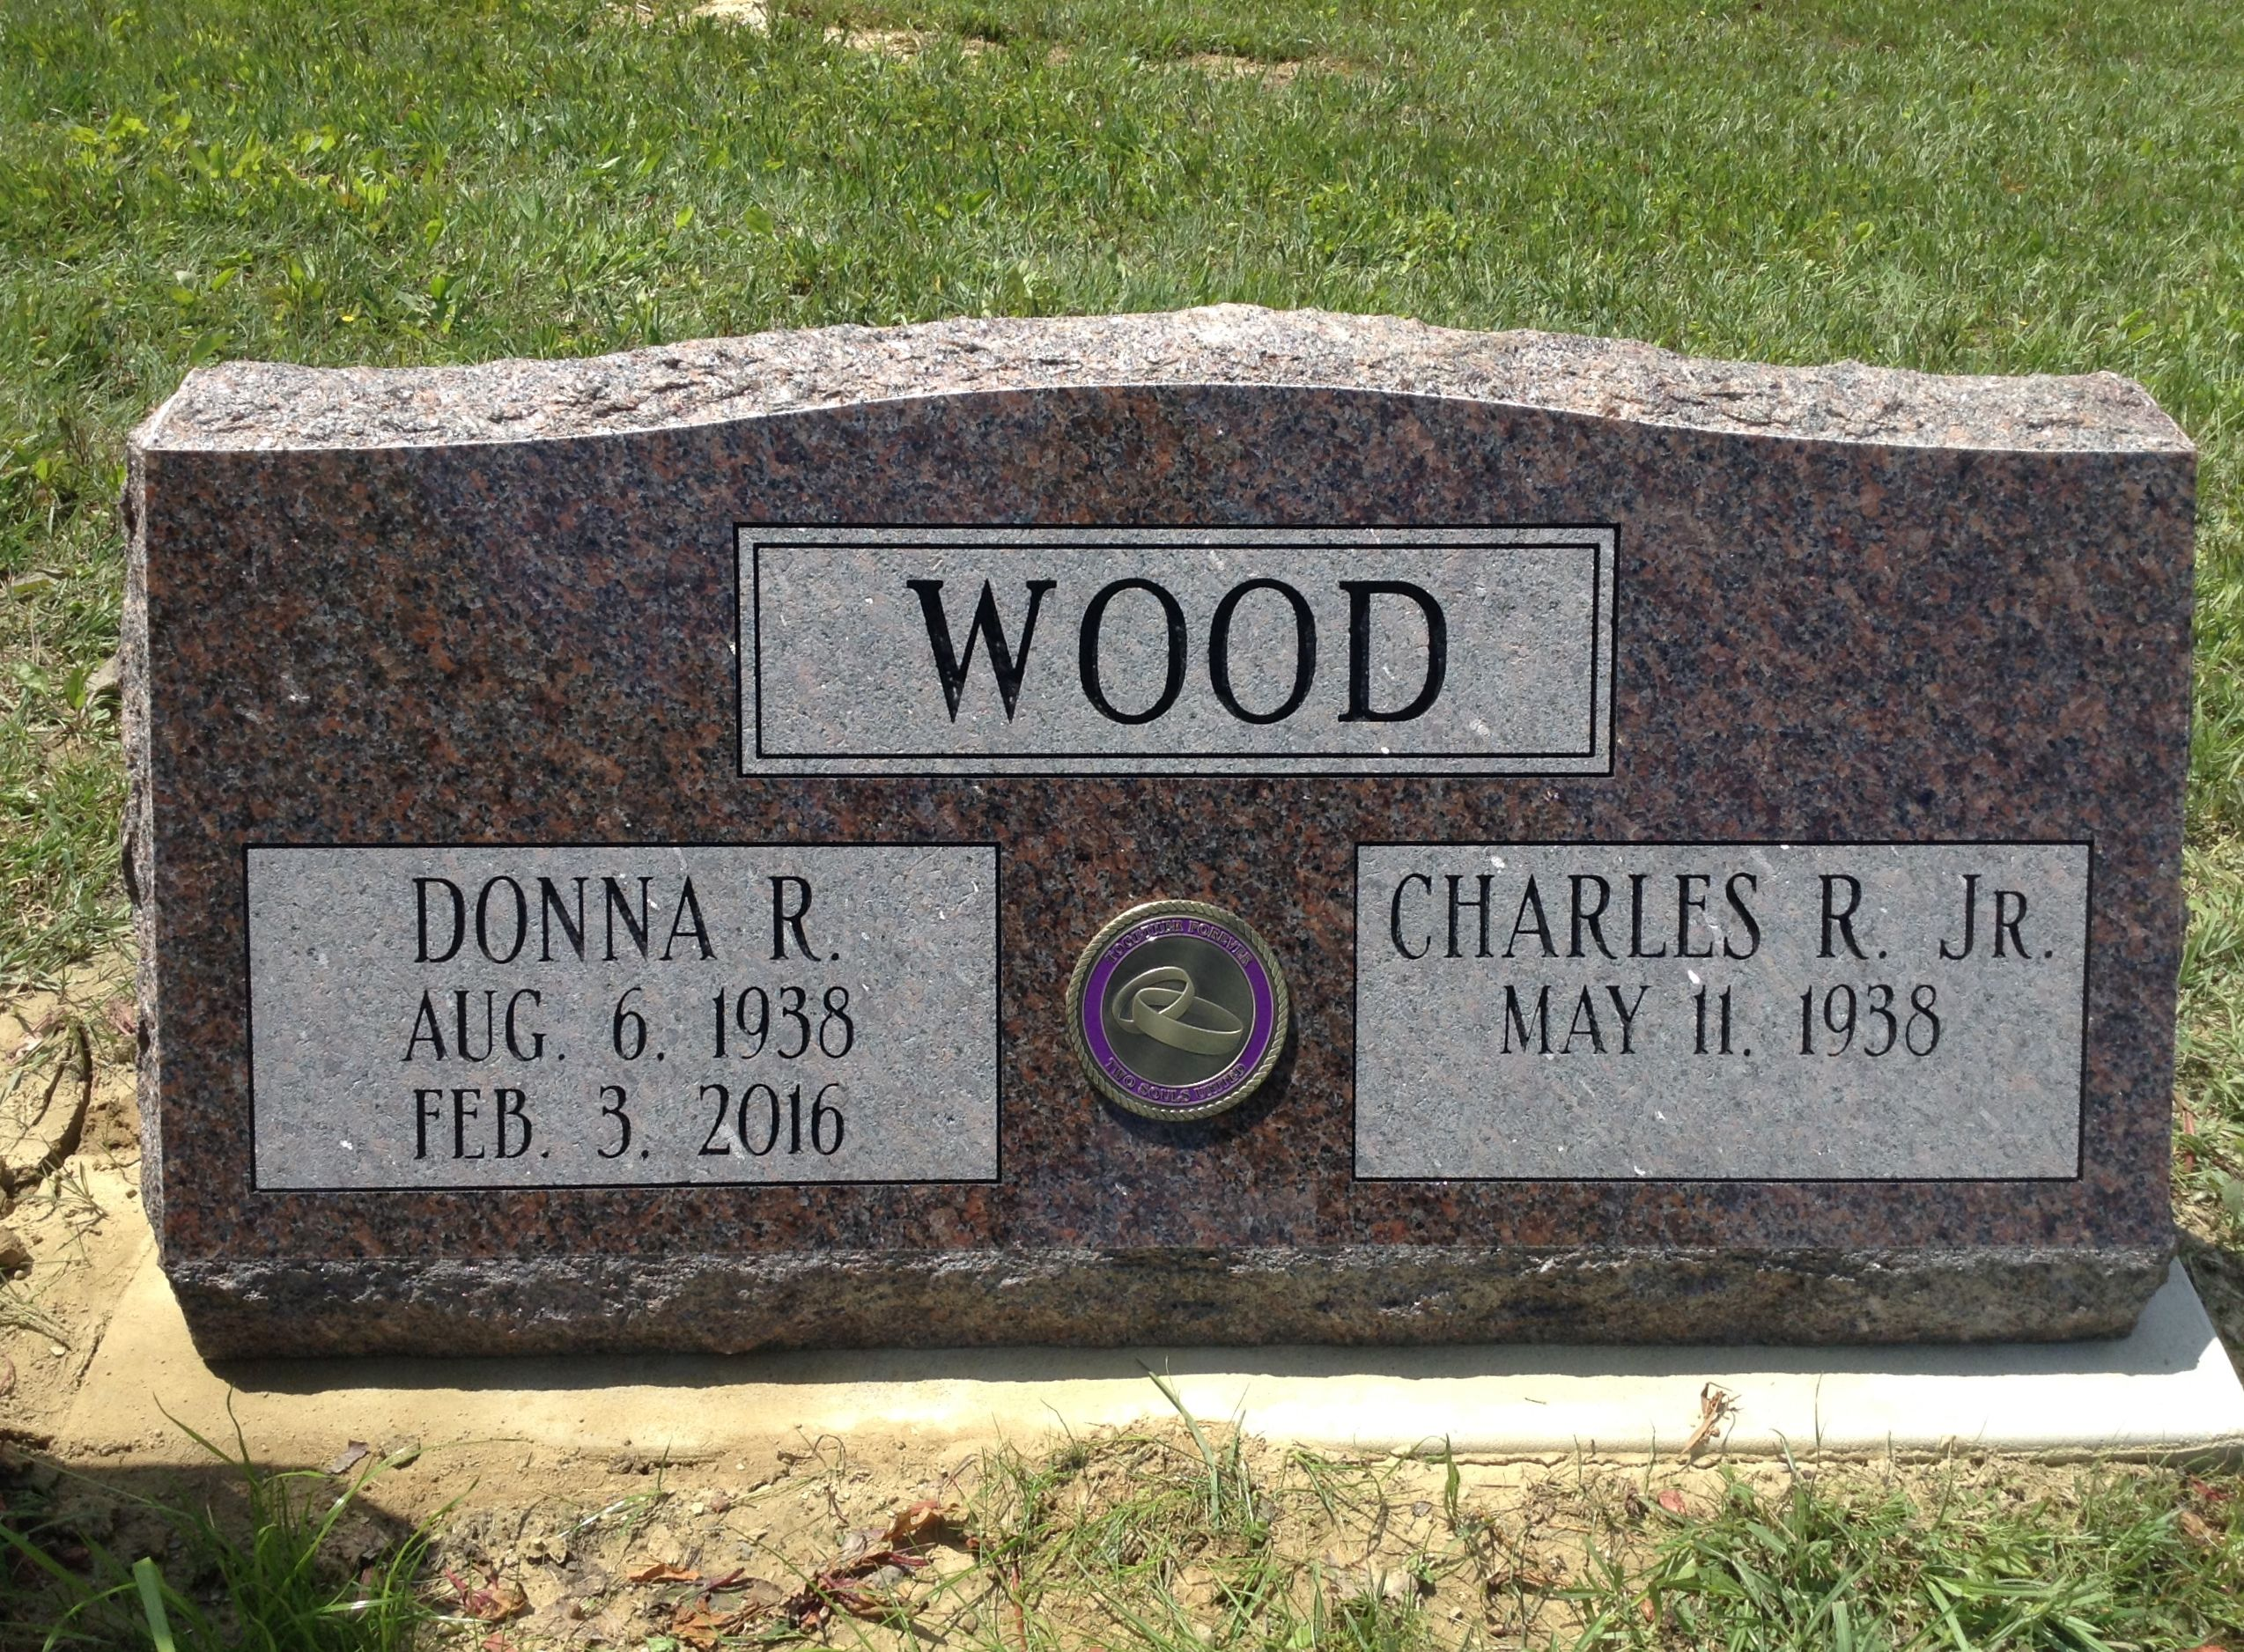 Wood, Charles